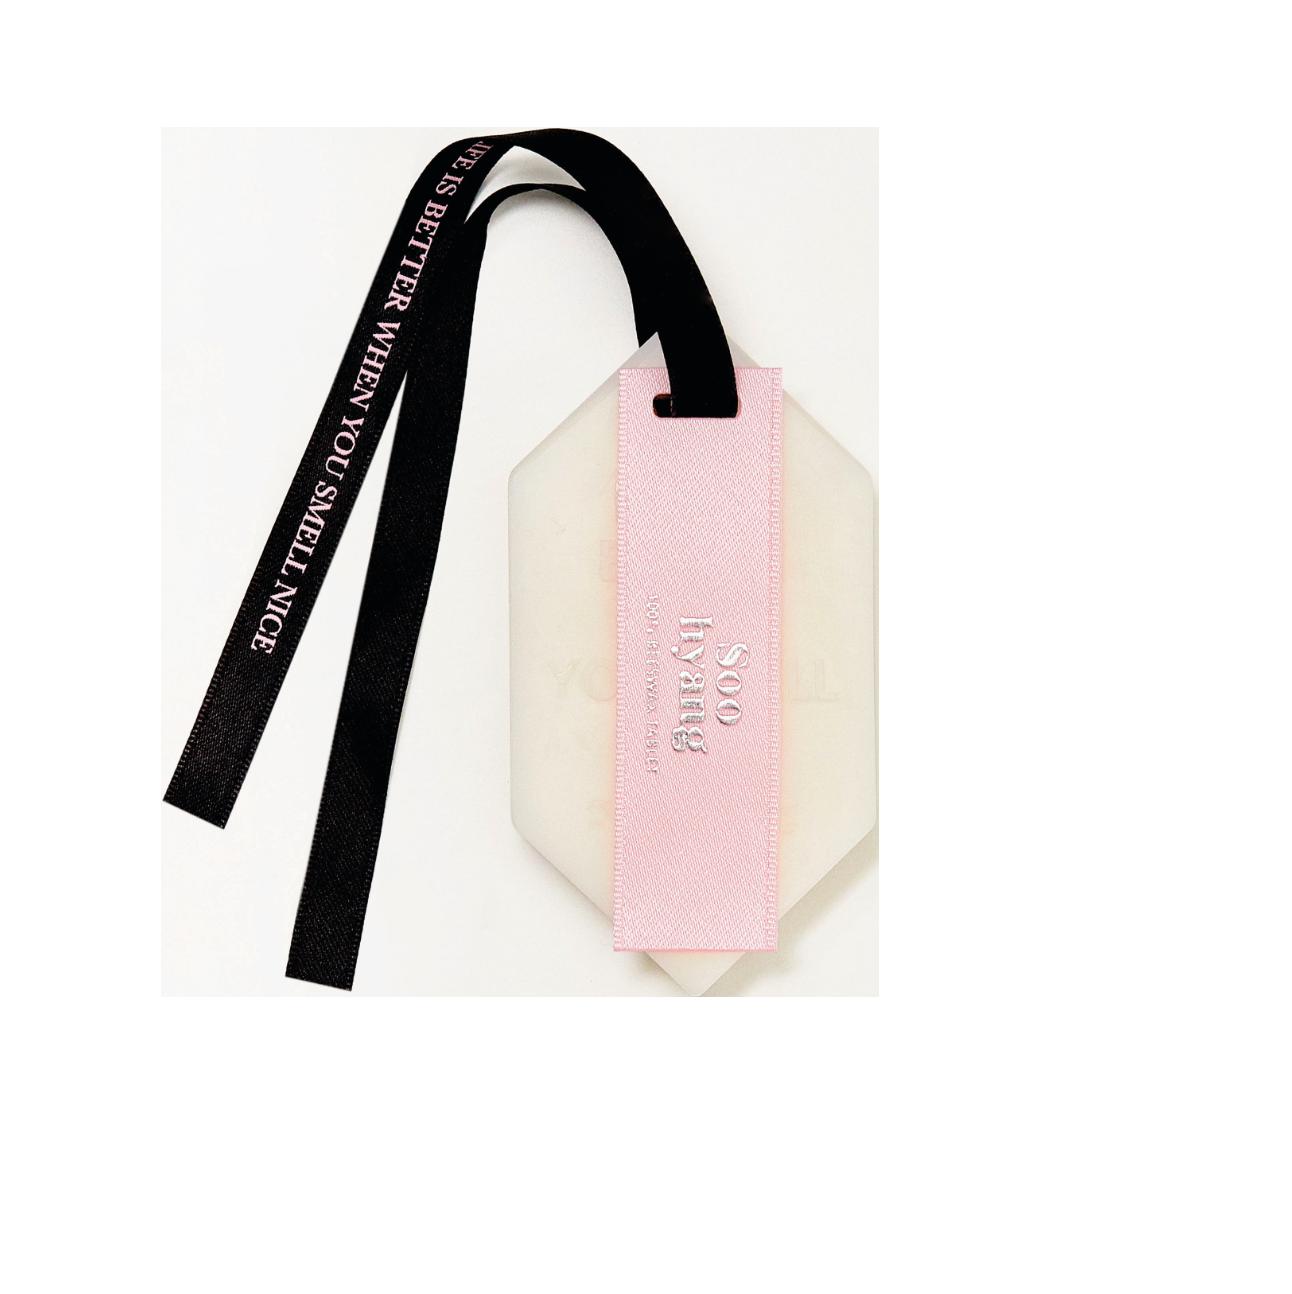 soohyang-itaewon-565-tablette-parfumee-avis